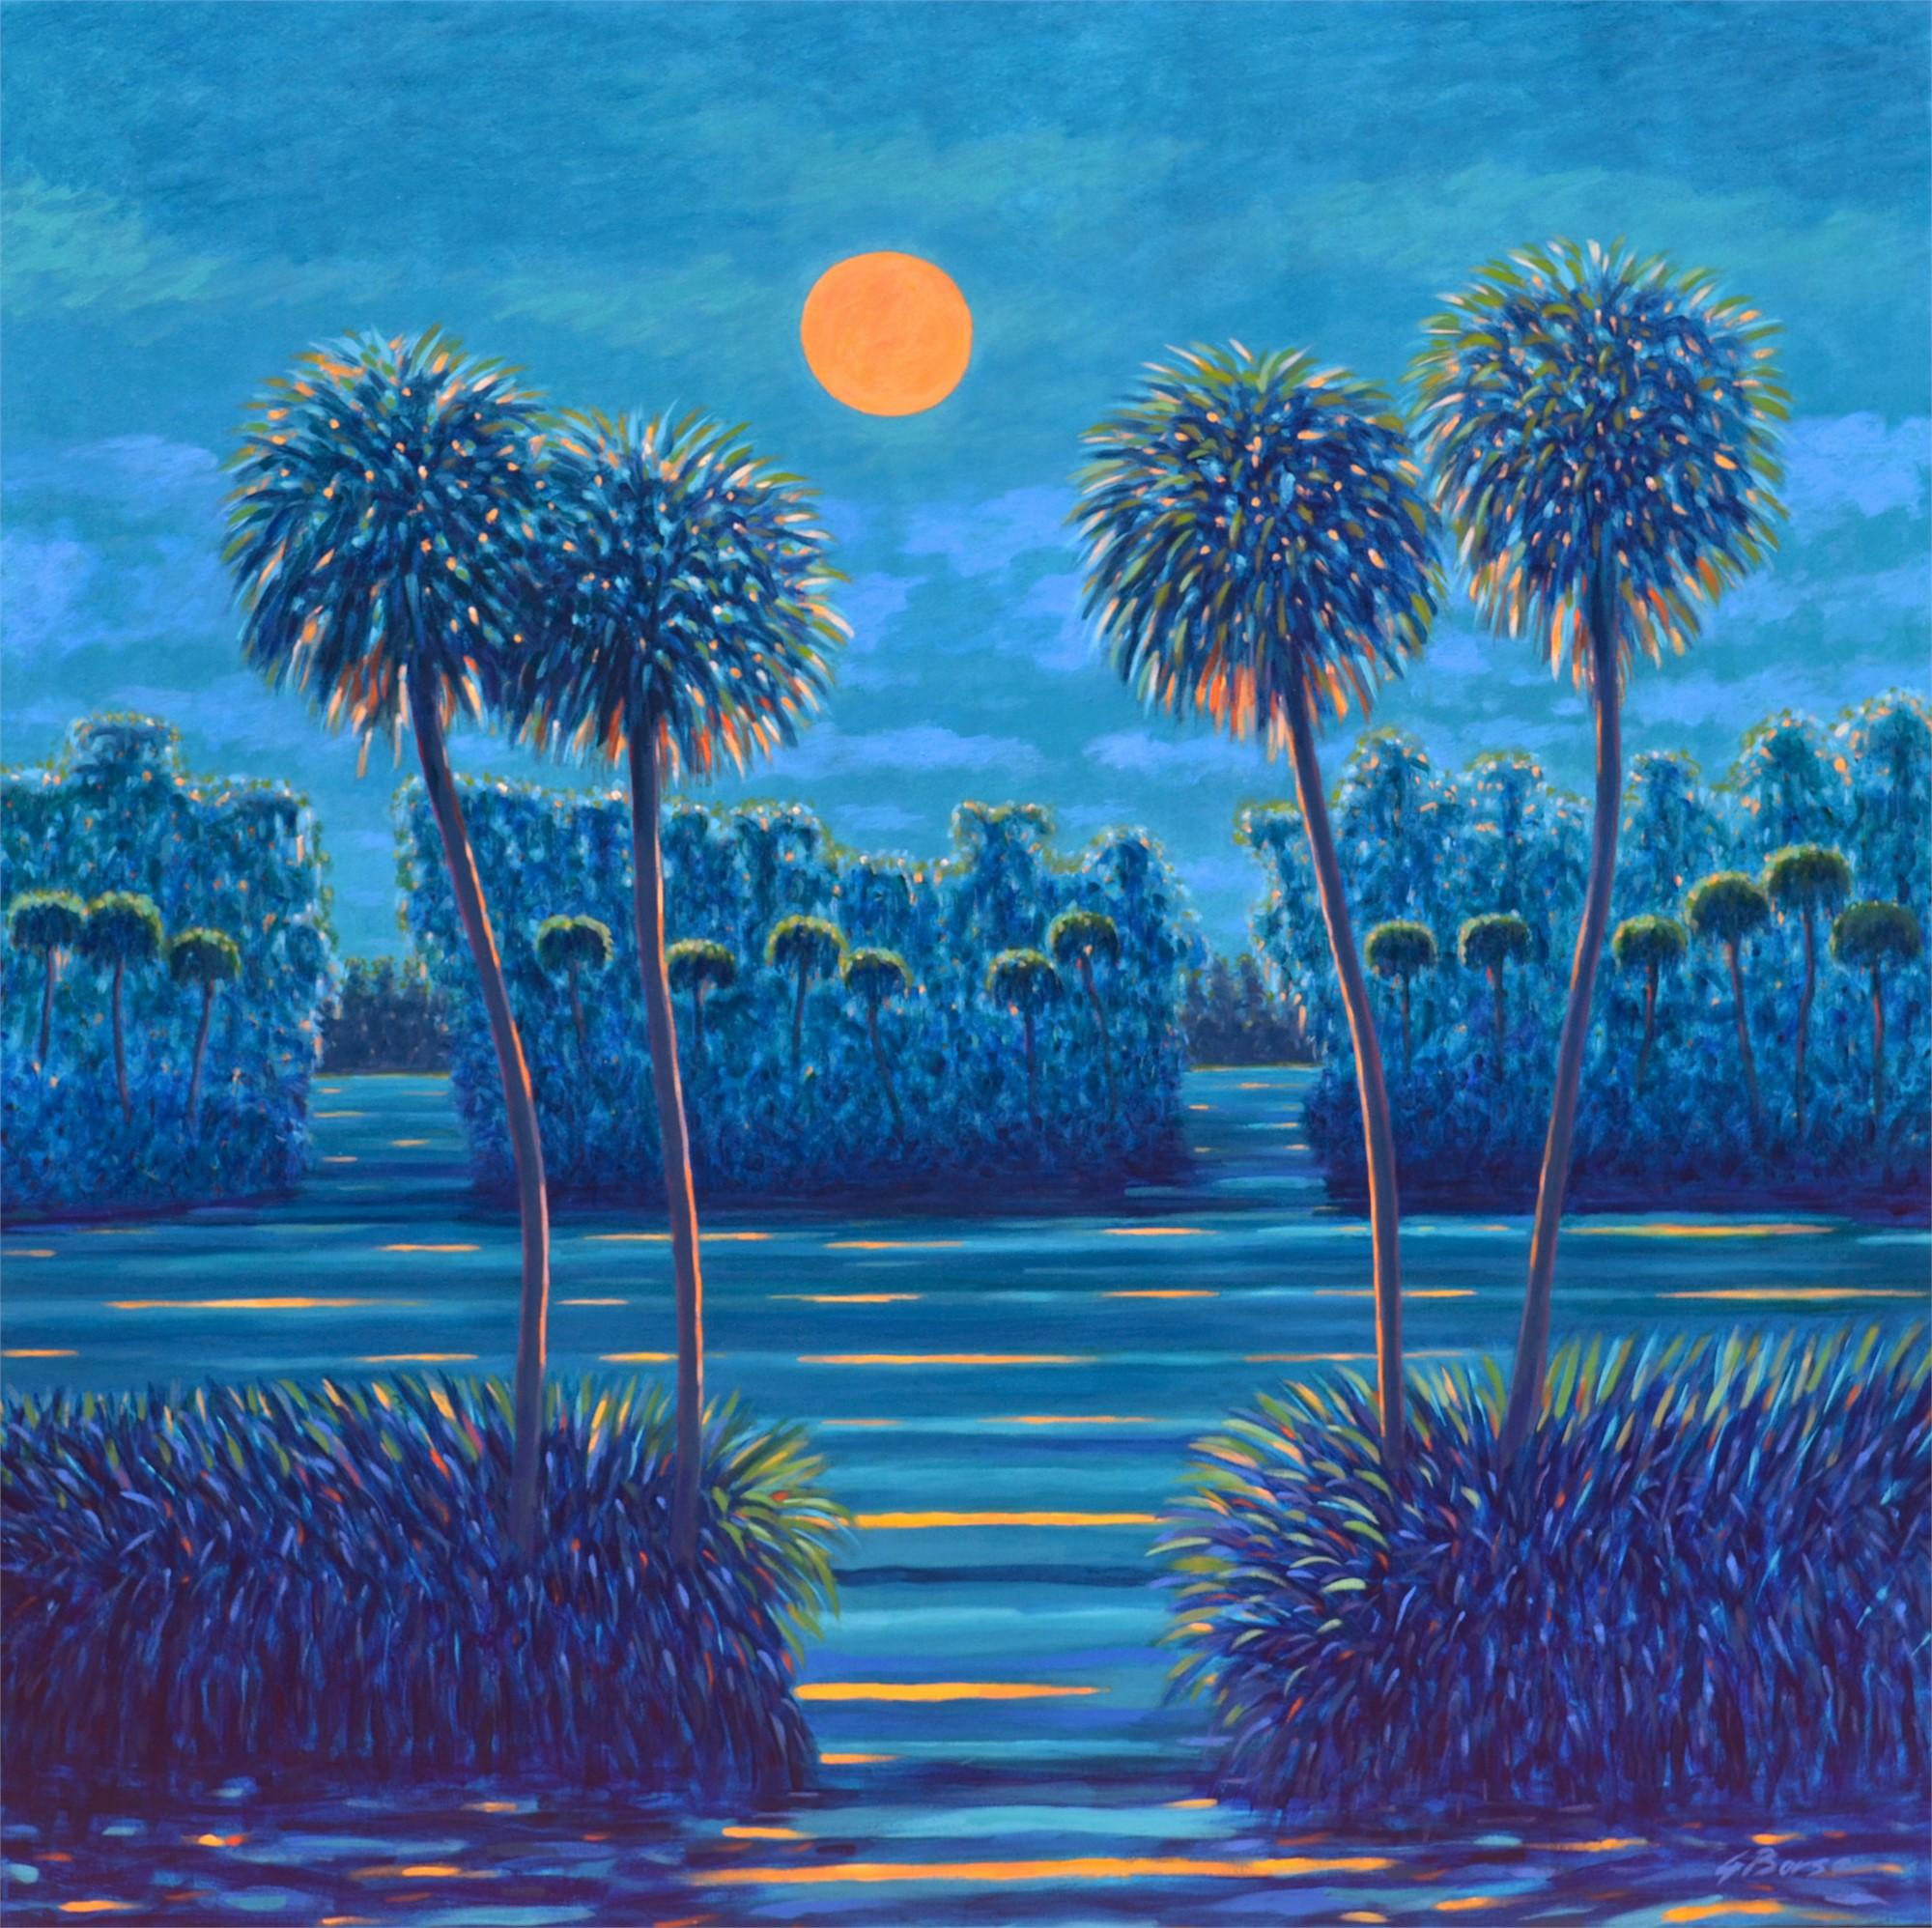 Moonstruck by Gary Borse